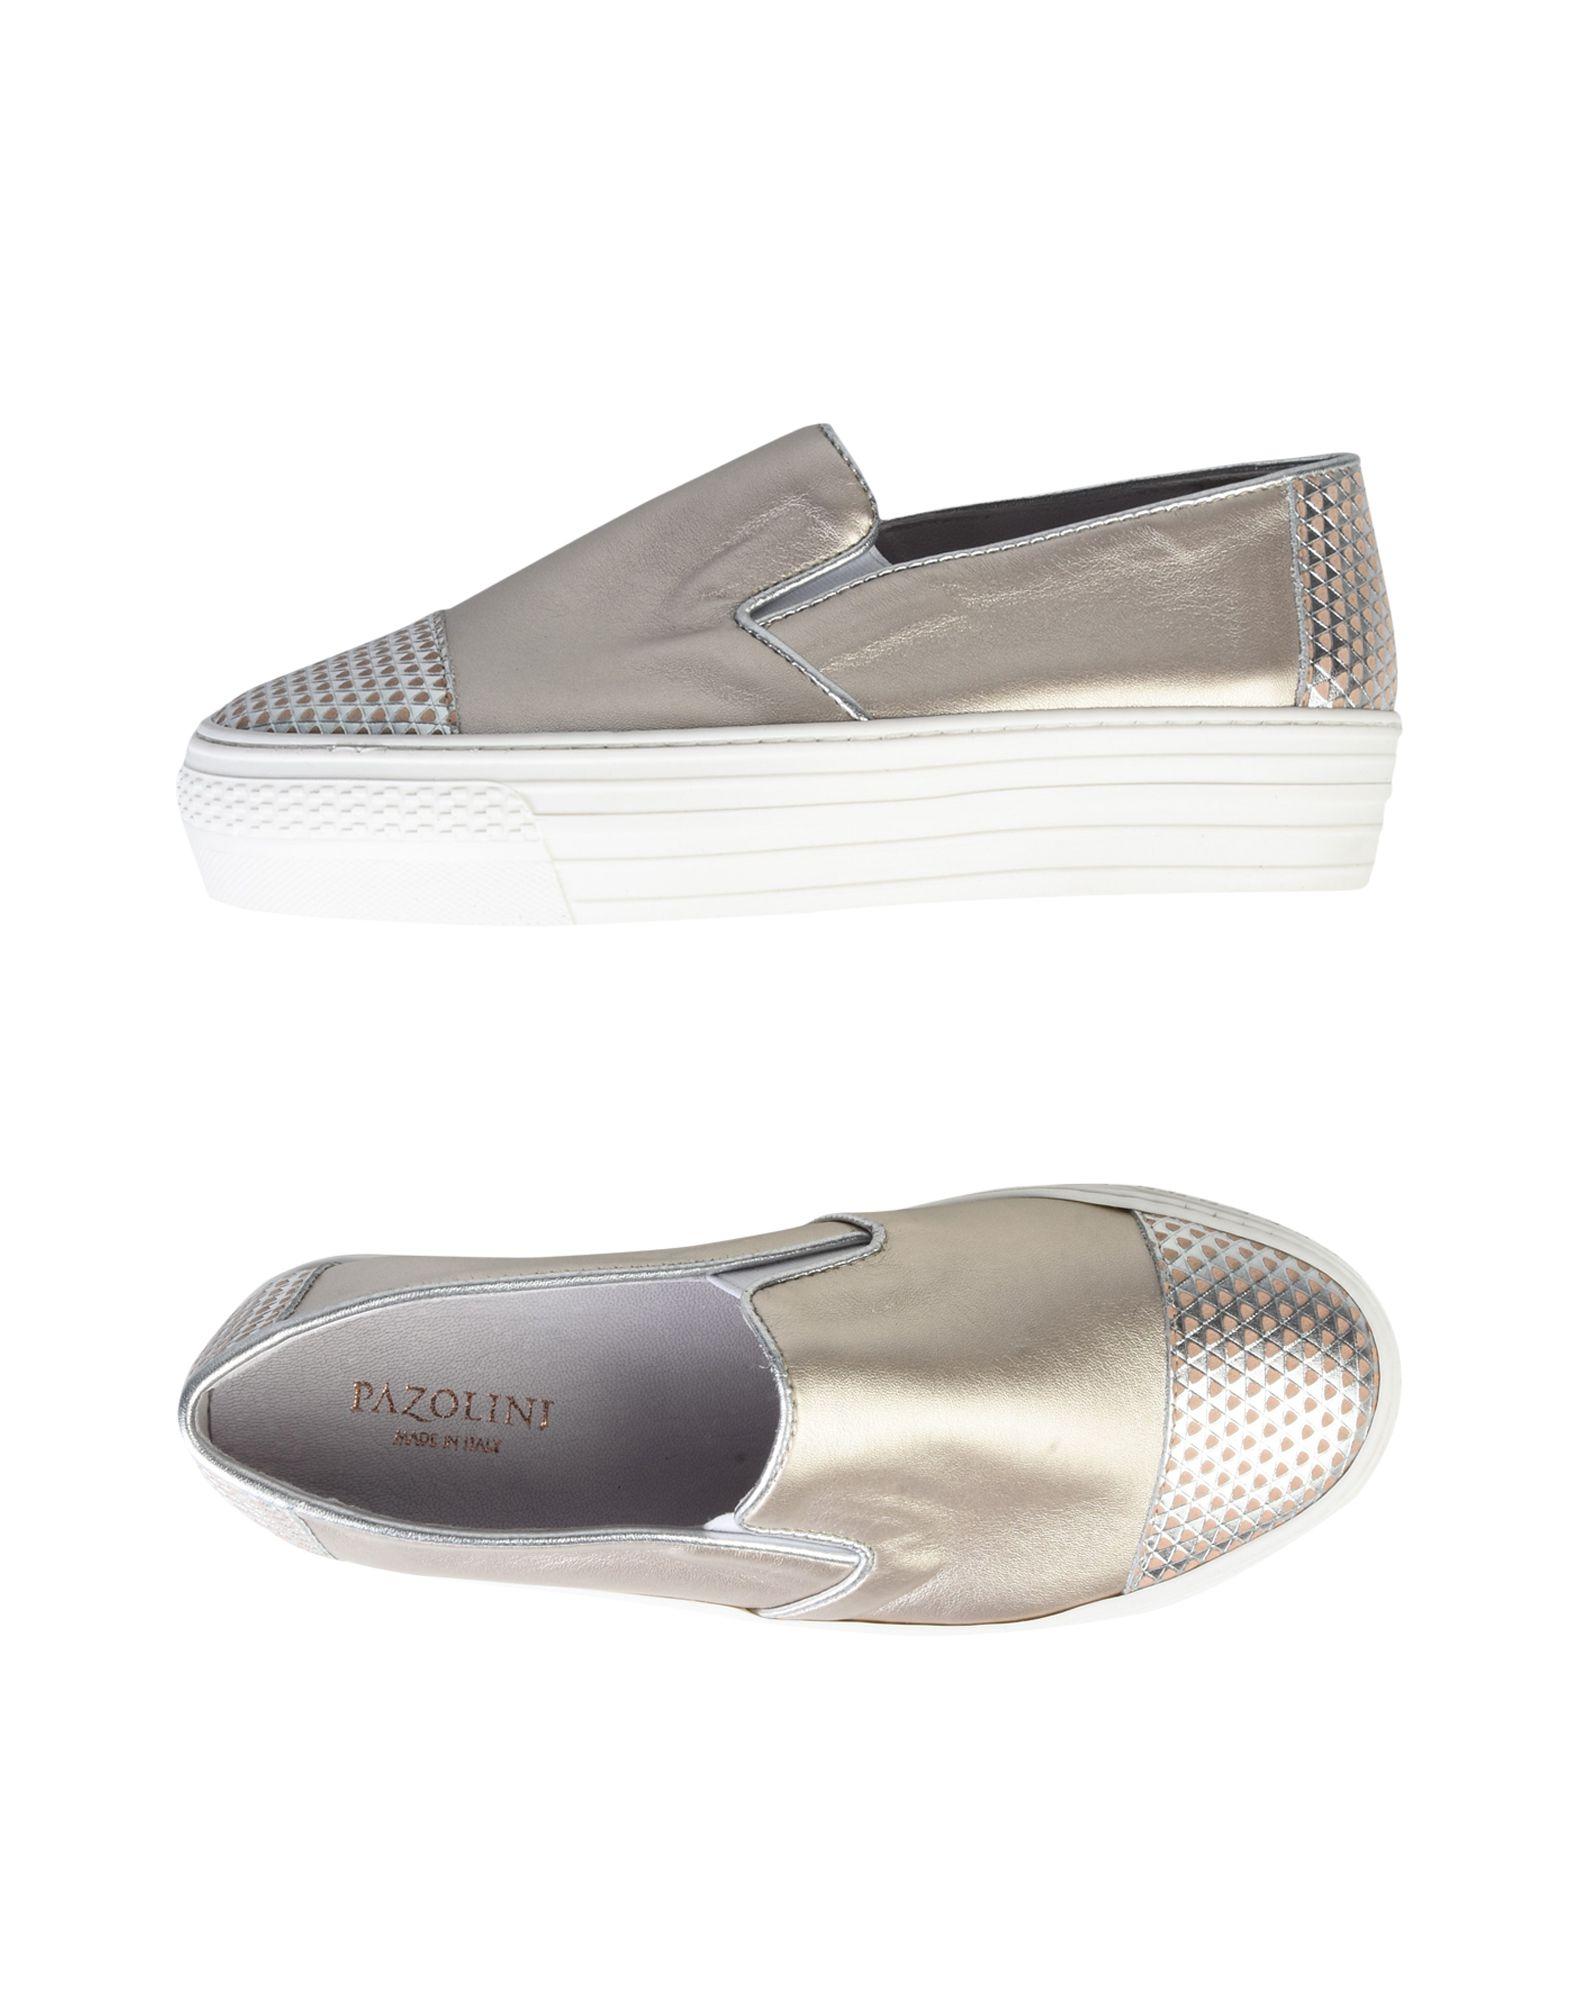 Carlo Pazolini Sneakers Damen Damen Sneakers  11196208UD 9b3059